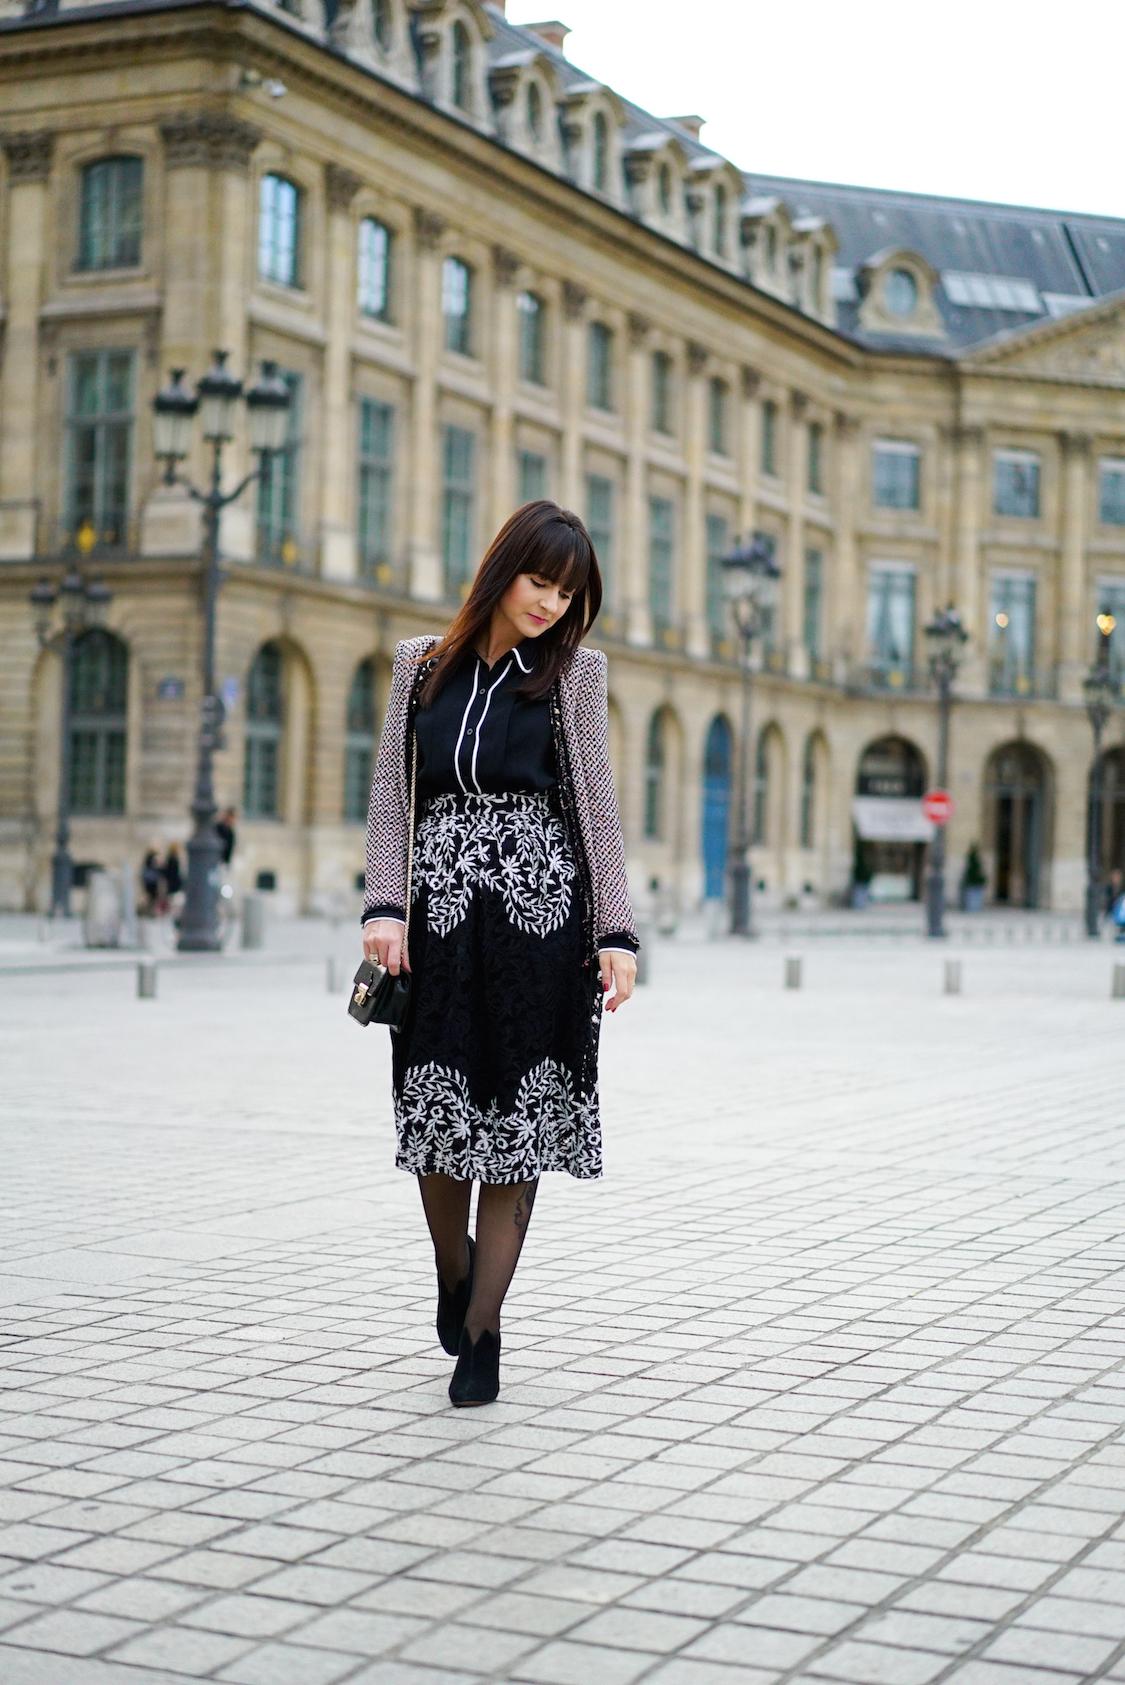 look-paris-fashion-week-re-see-valentino-2015-danielle-noce-4